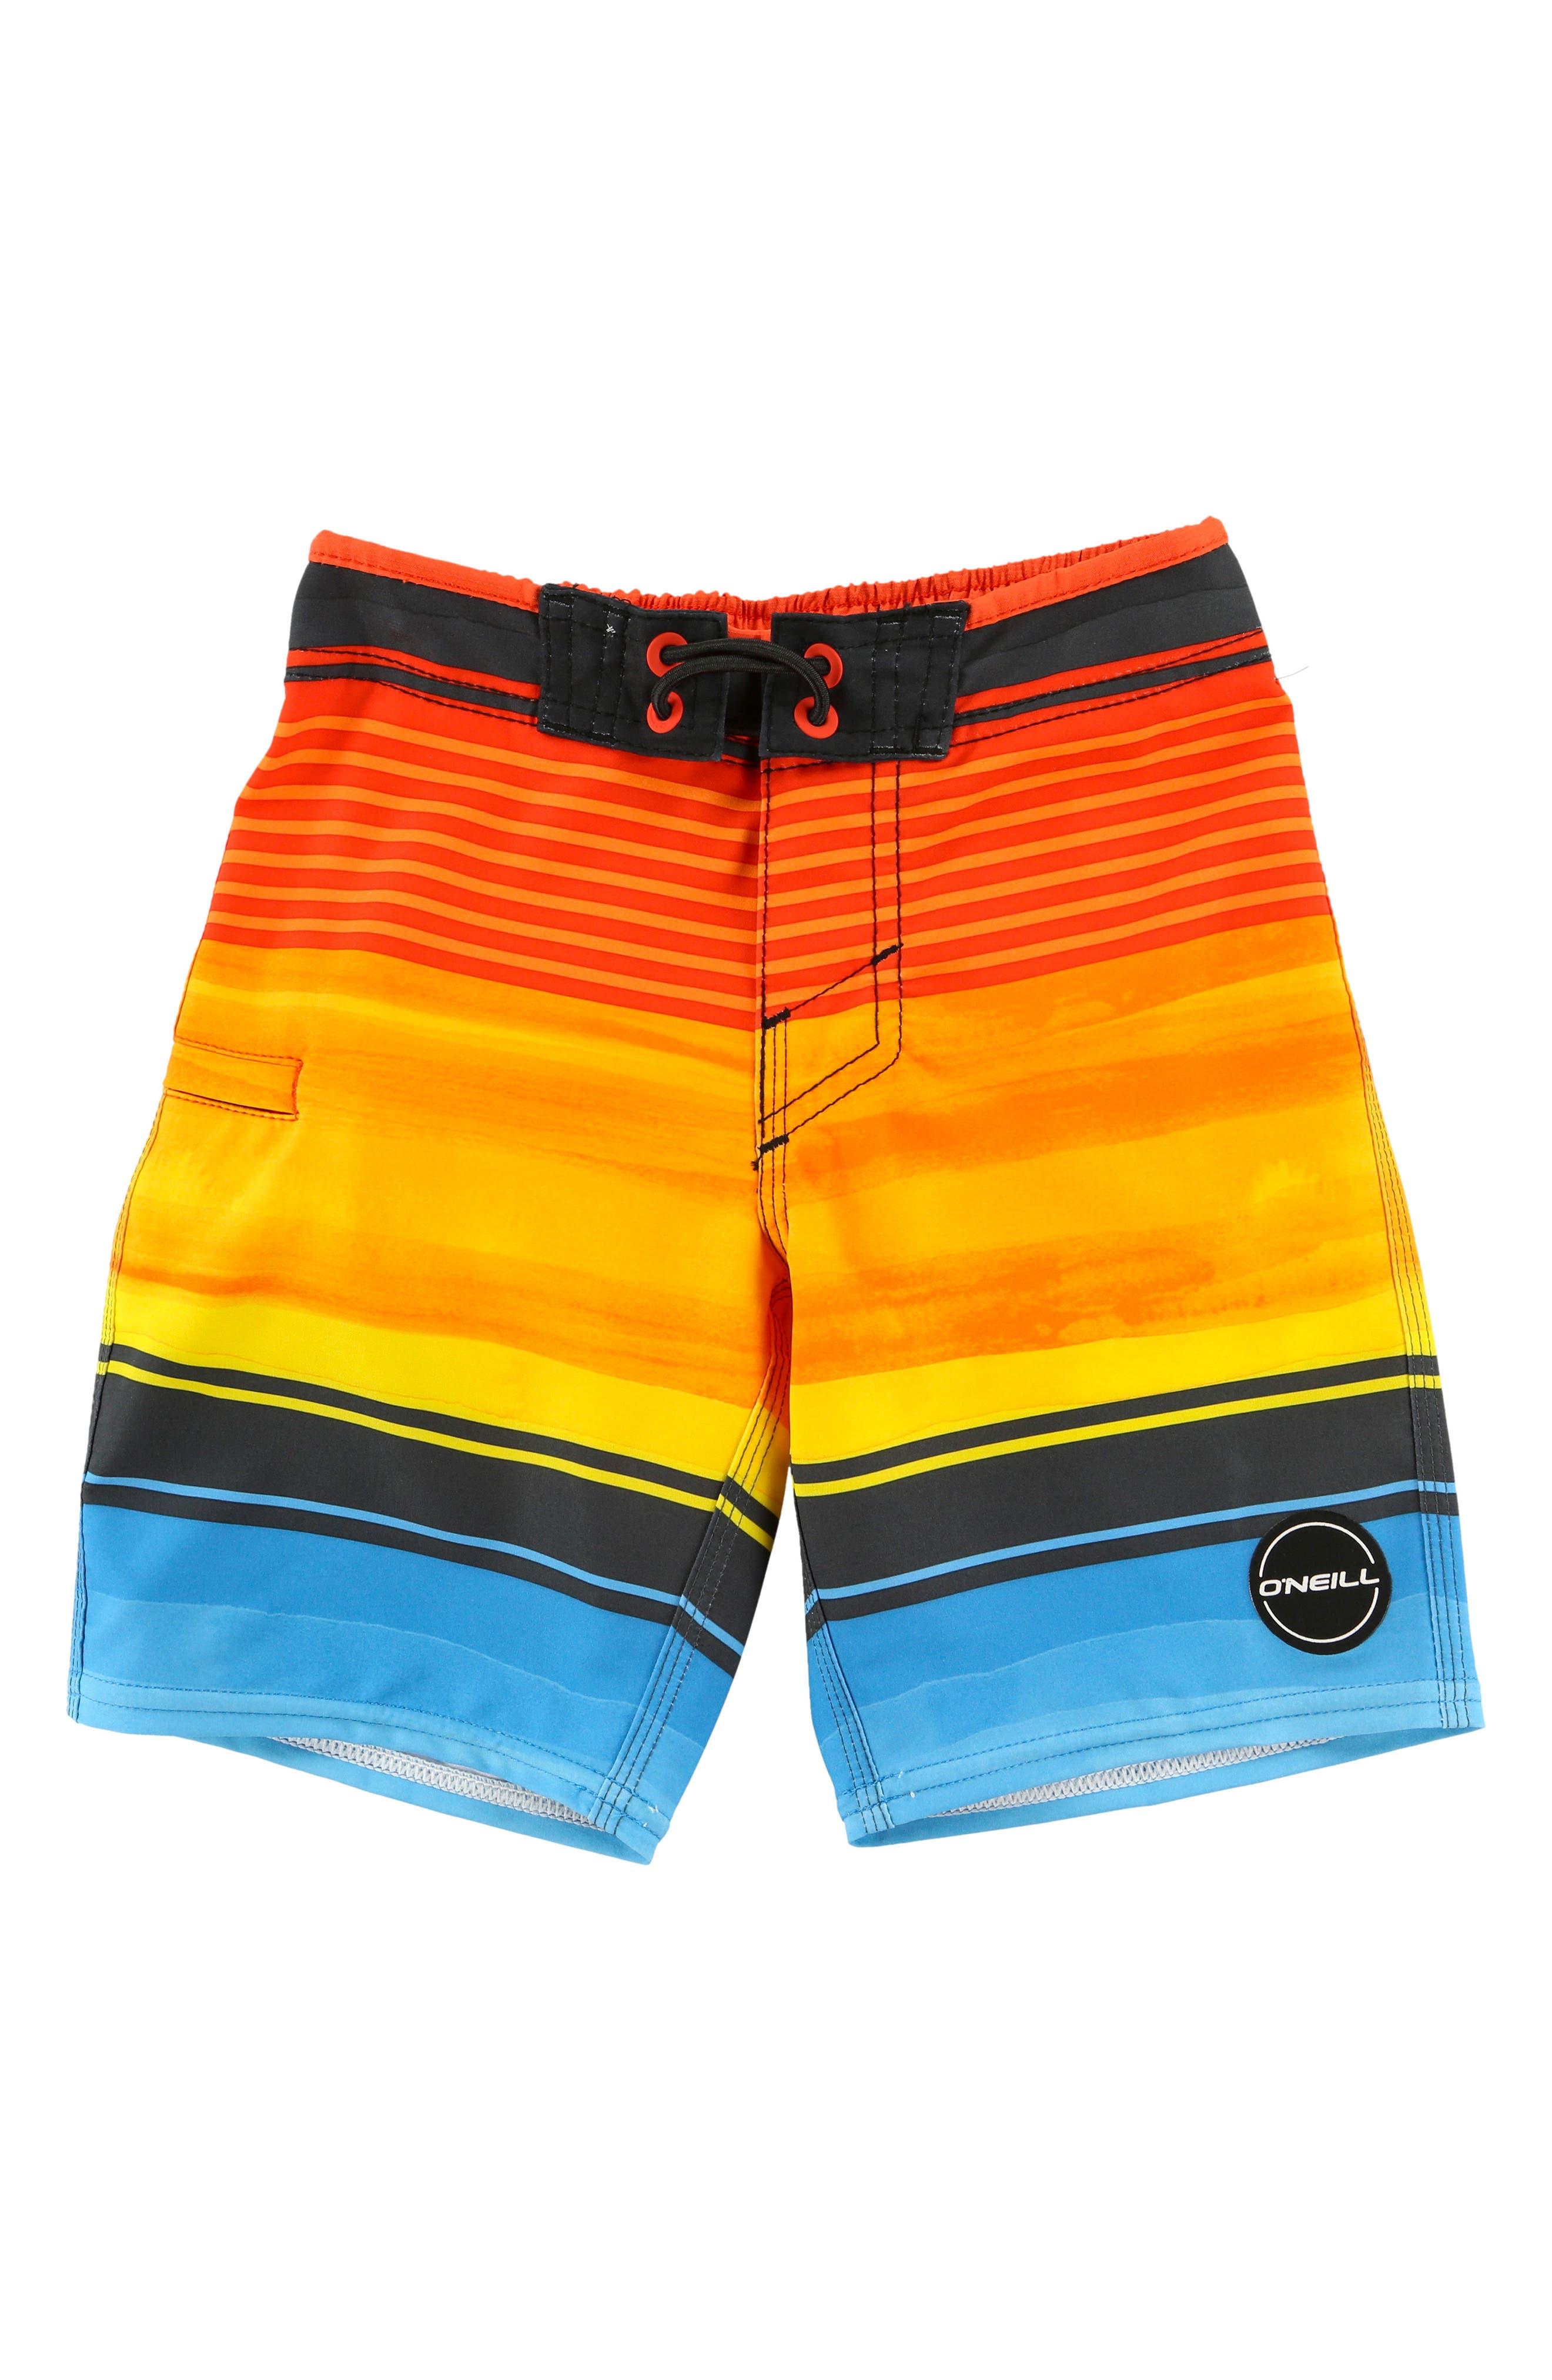 Hyperfreak Heist Board Shorts,                         Main,                         color, Orange